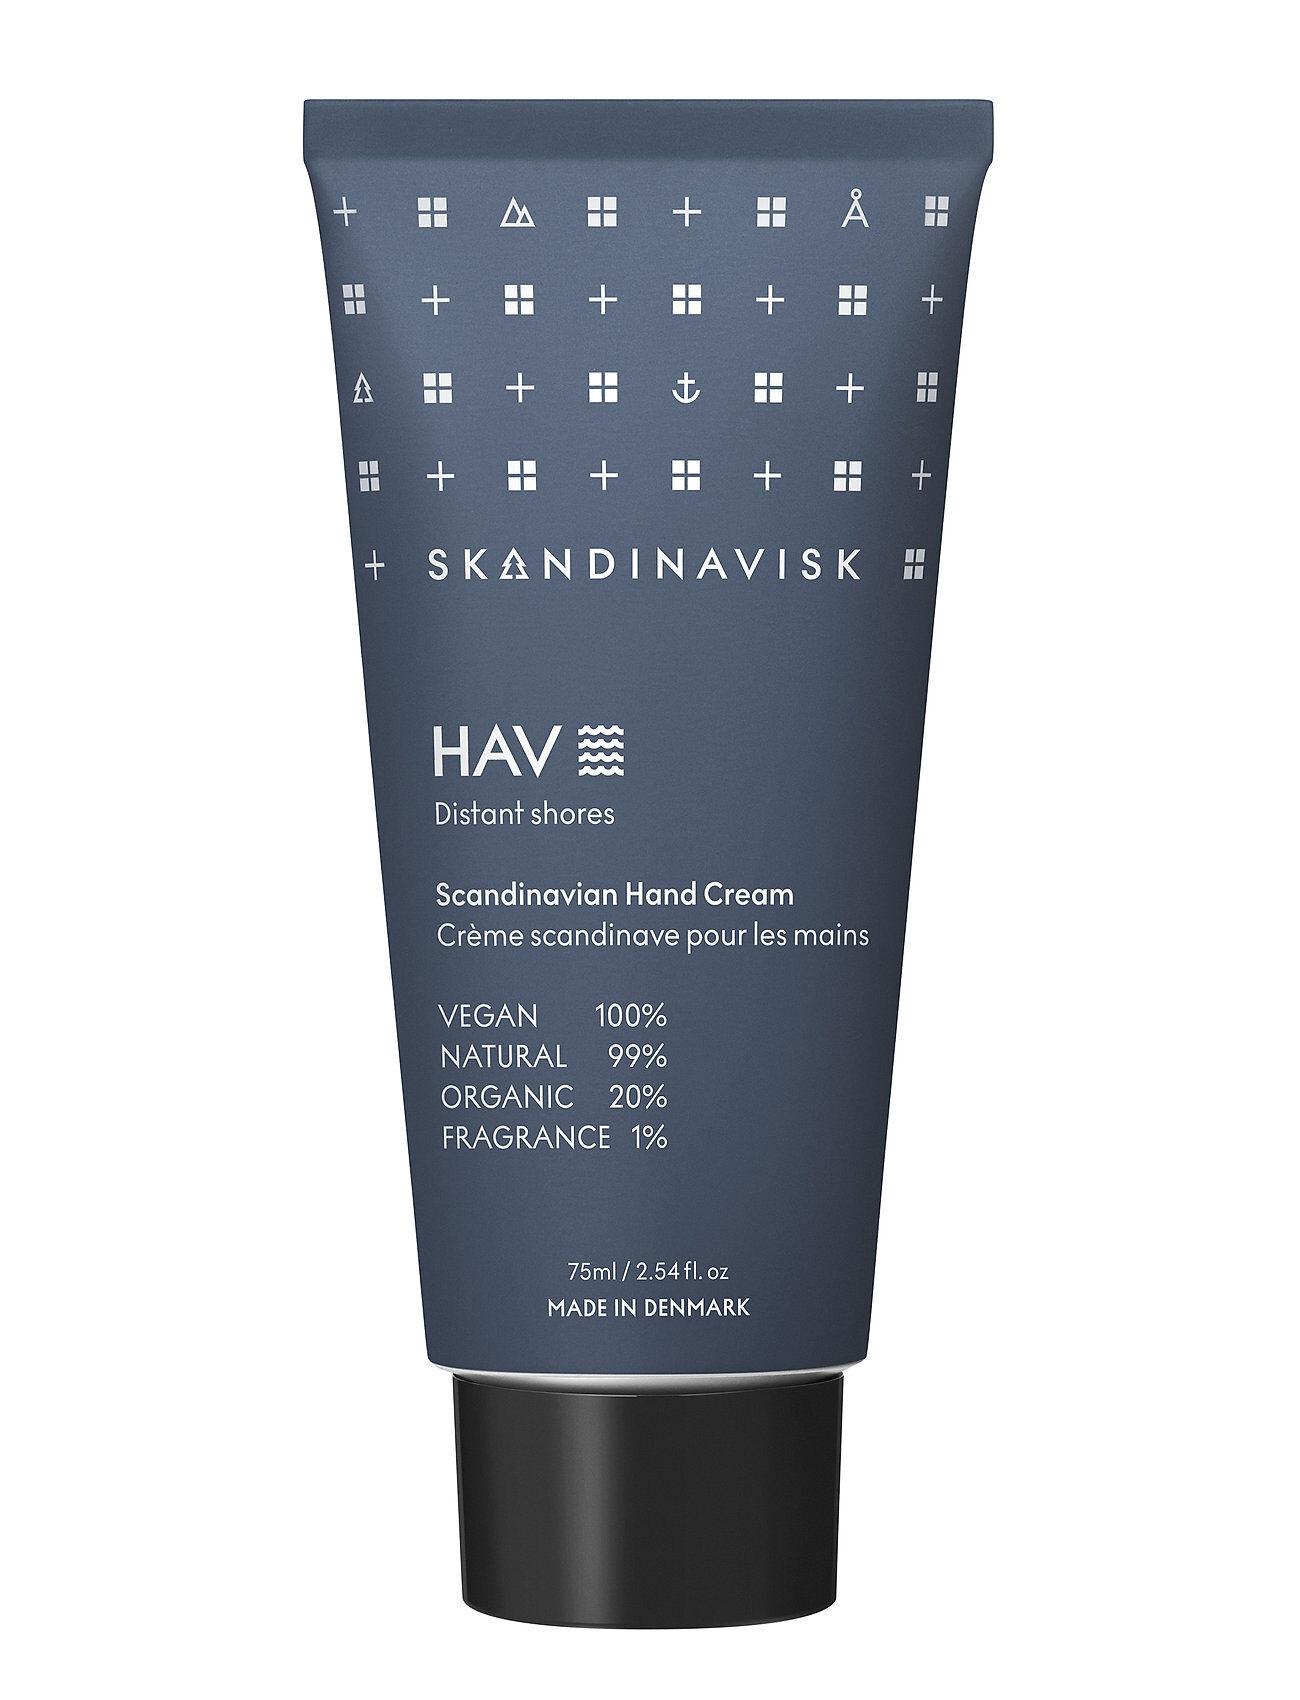 Skandinavisk Hav Hand Cream 75ml Beauty MEN Skin Care Body Hand Cream Nude Skandinavisk